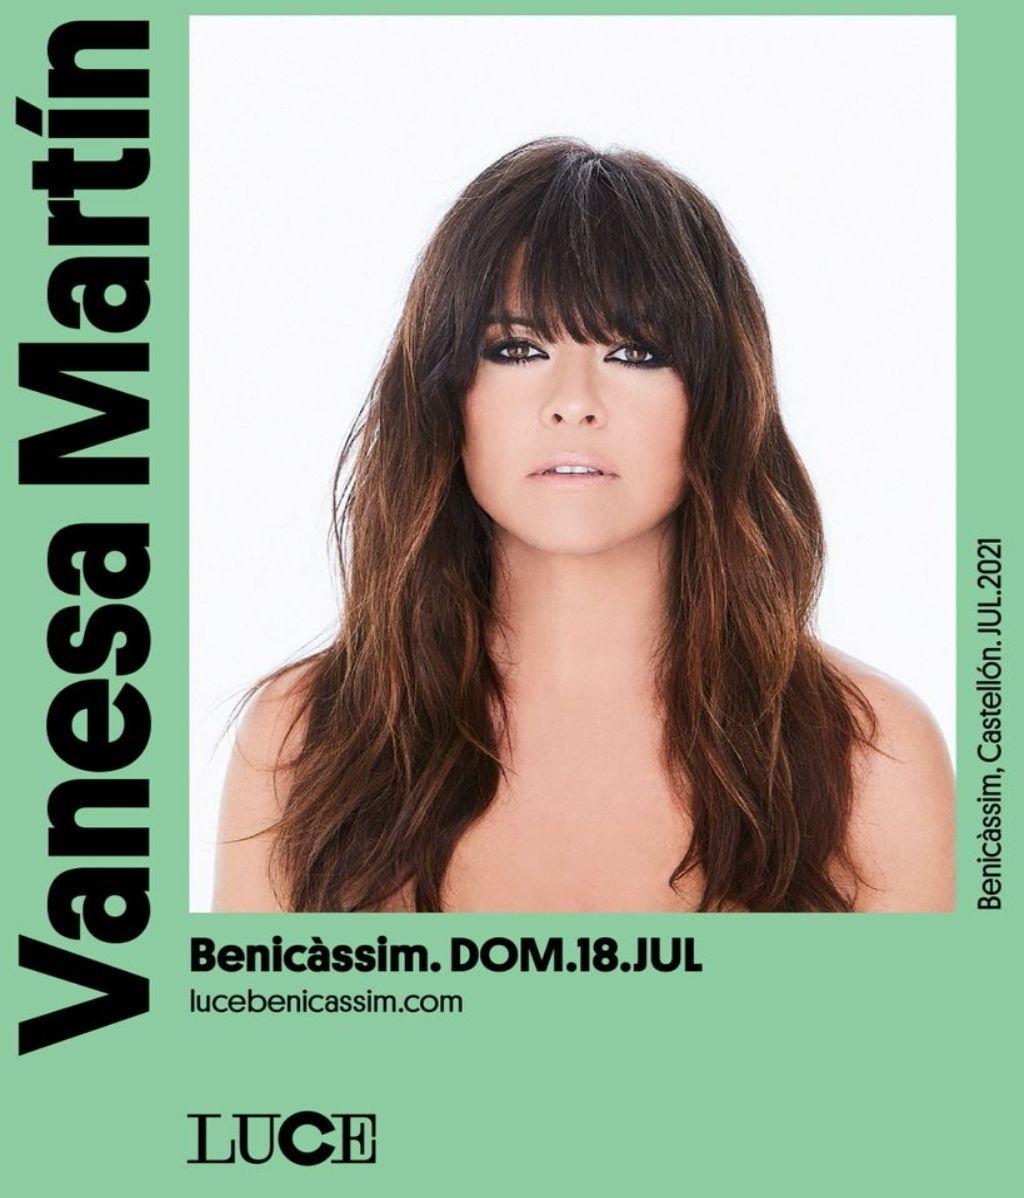 VANESA MARTIN LUCE BENICASSIMv